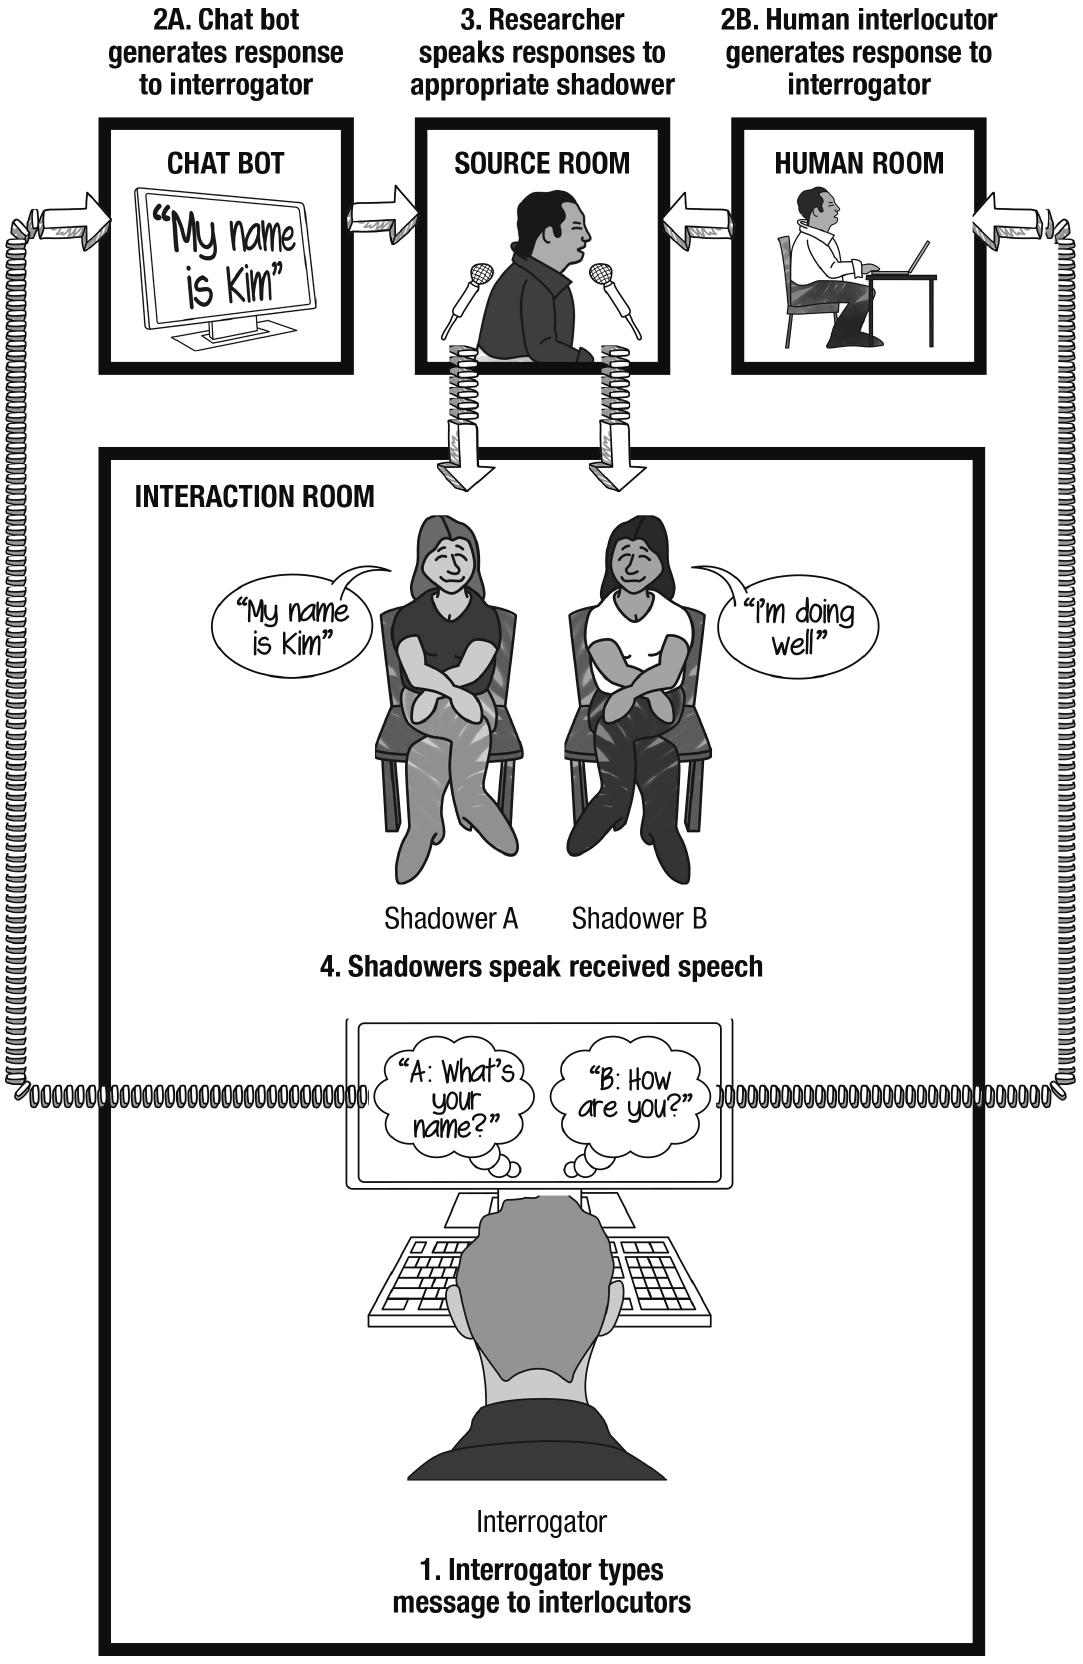 Human-AI echoborgs make chatbots more real, but still fail